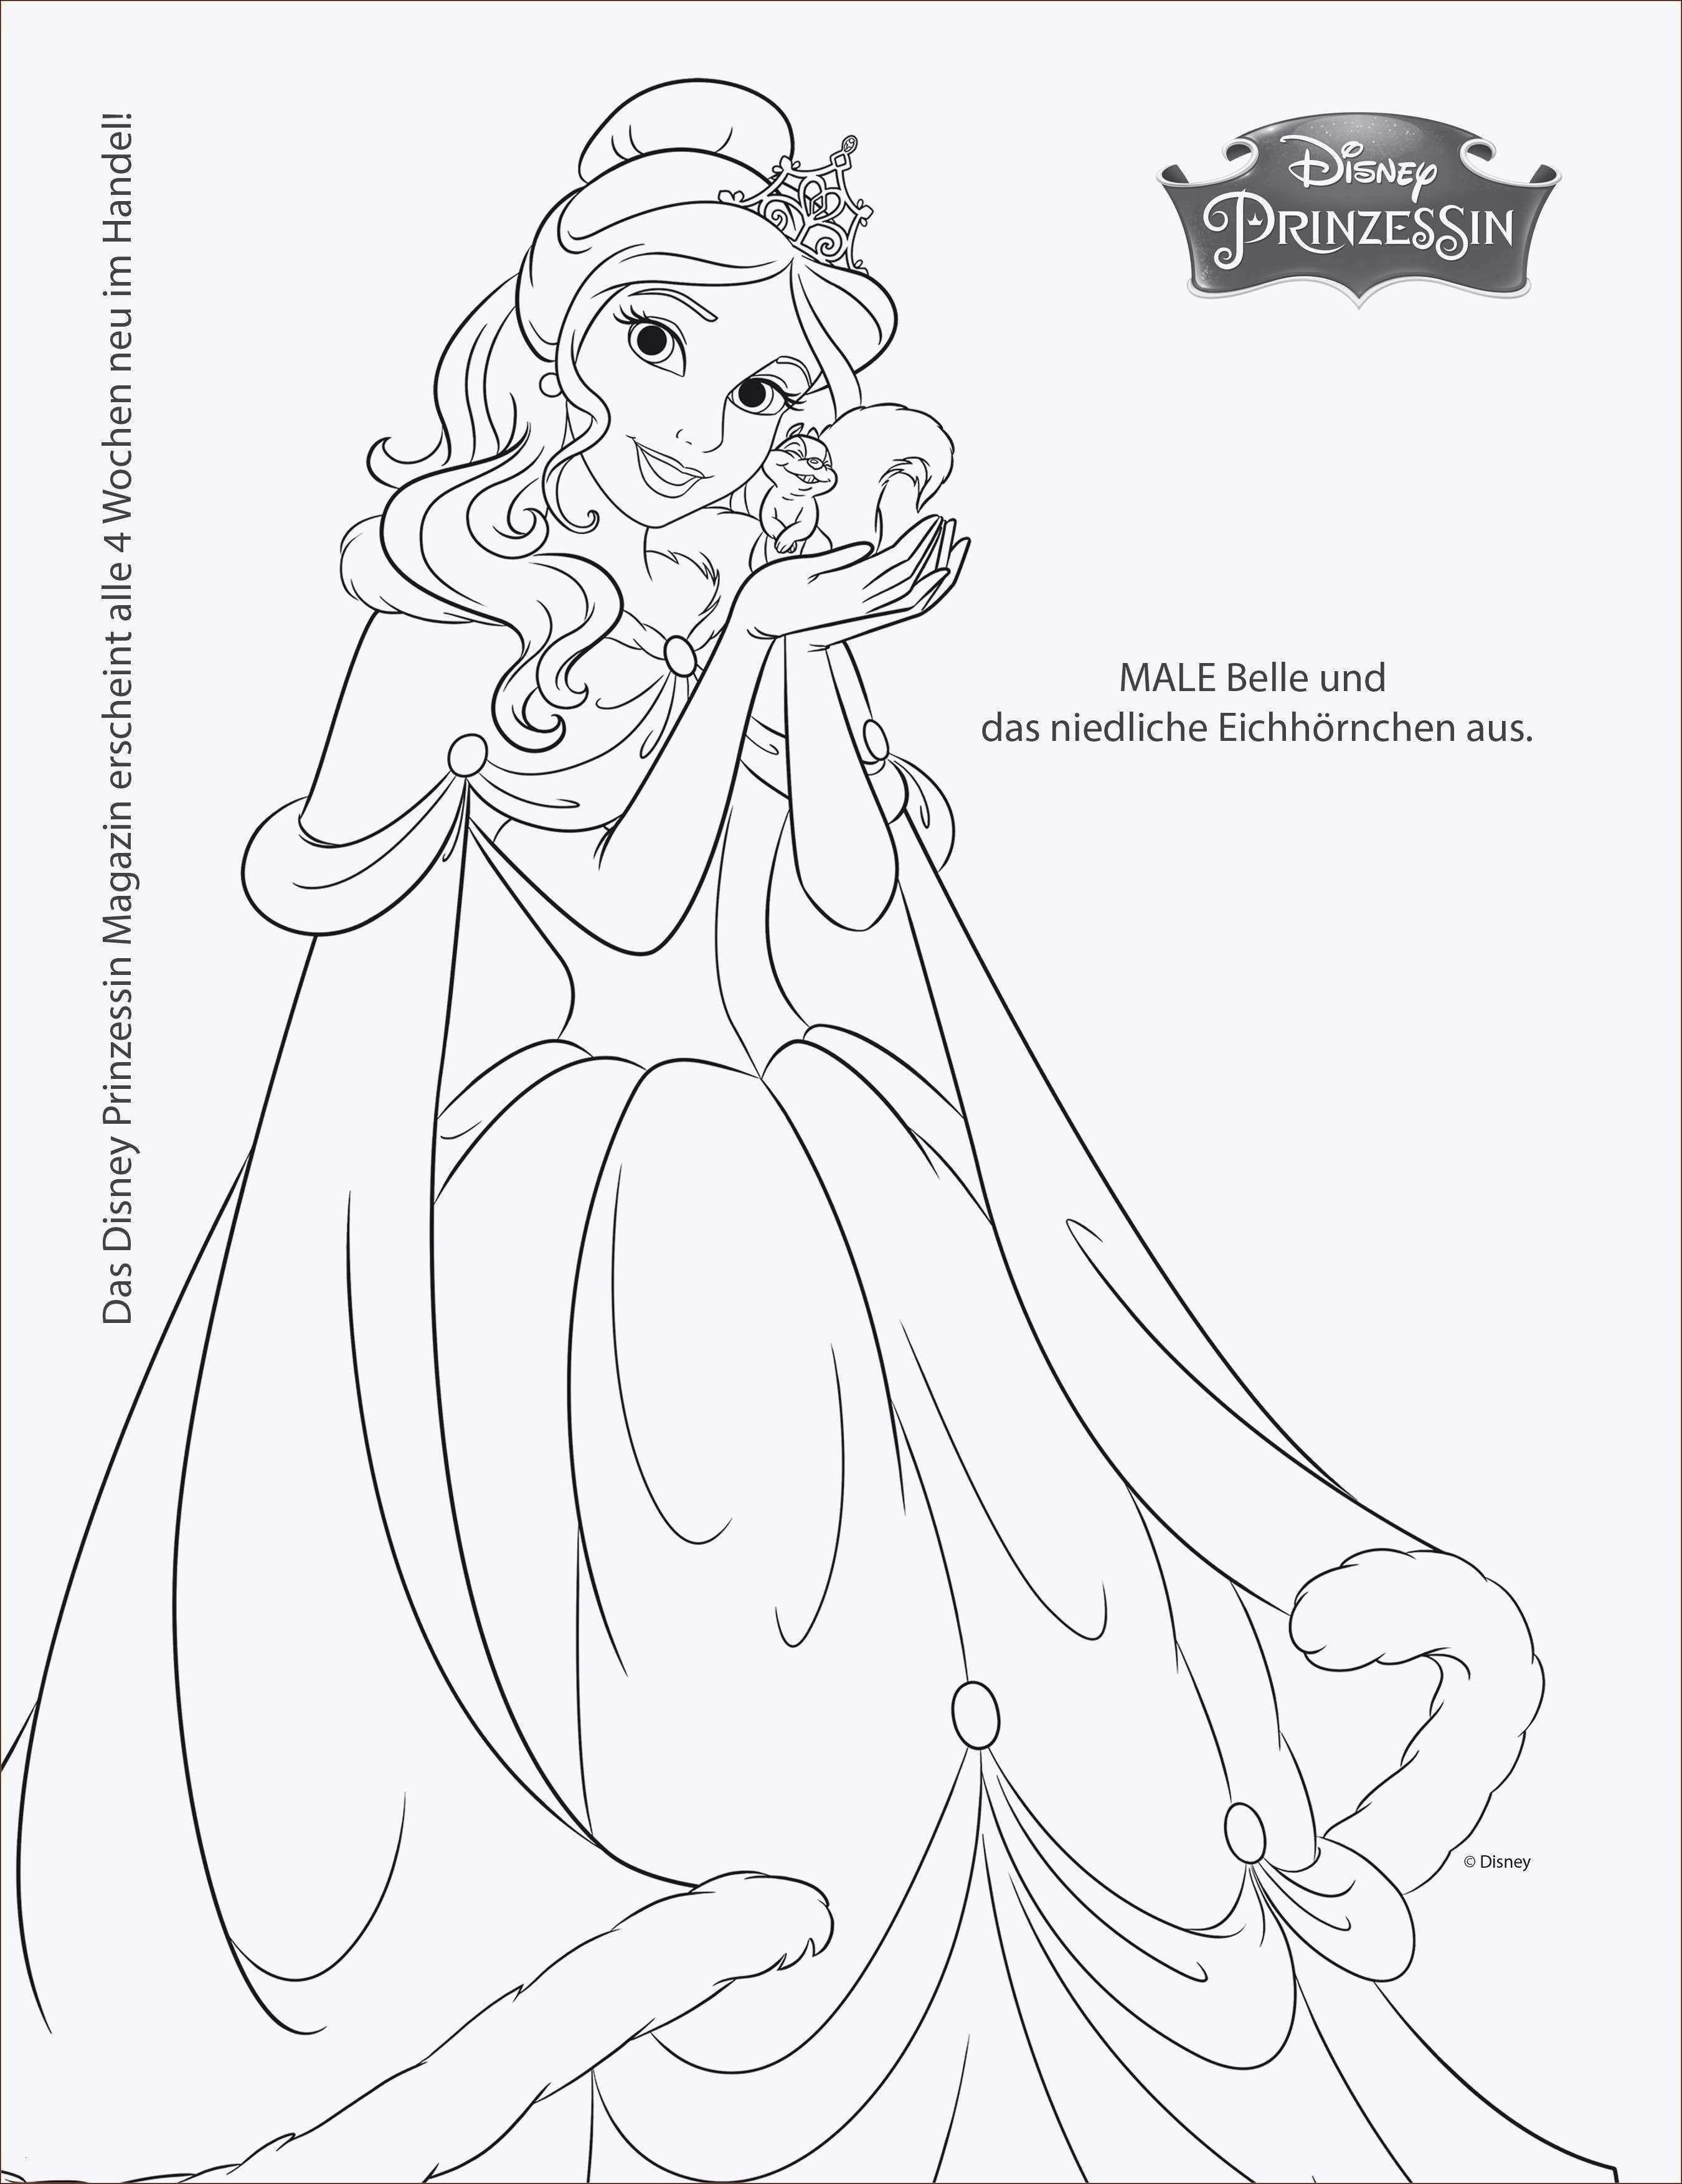 Neu Malvorlagen Monster Quad Disney Coloring Sheets Disney Princess Coloring Pages Cartoon Coloring Pages